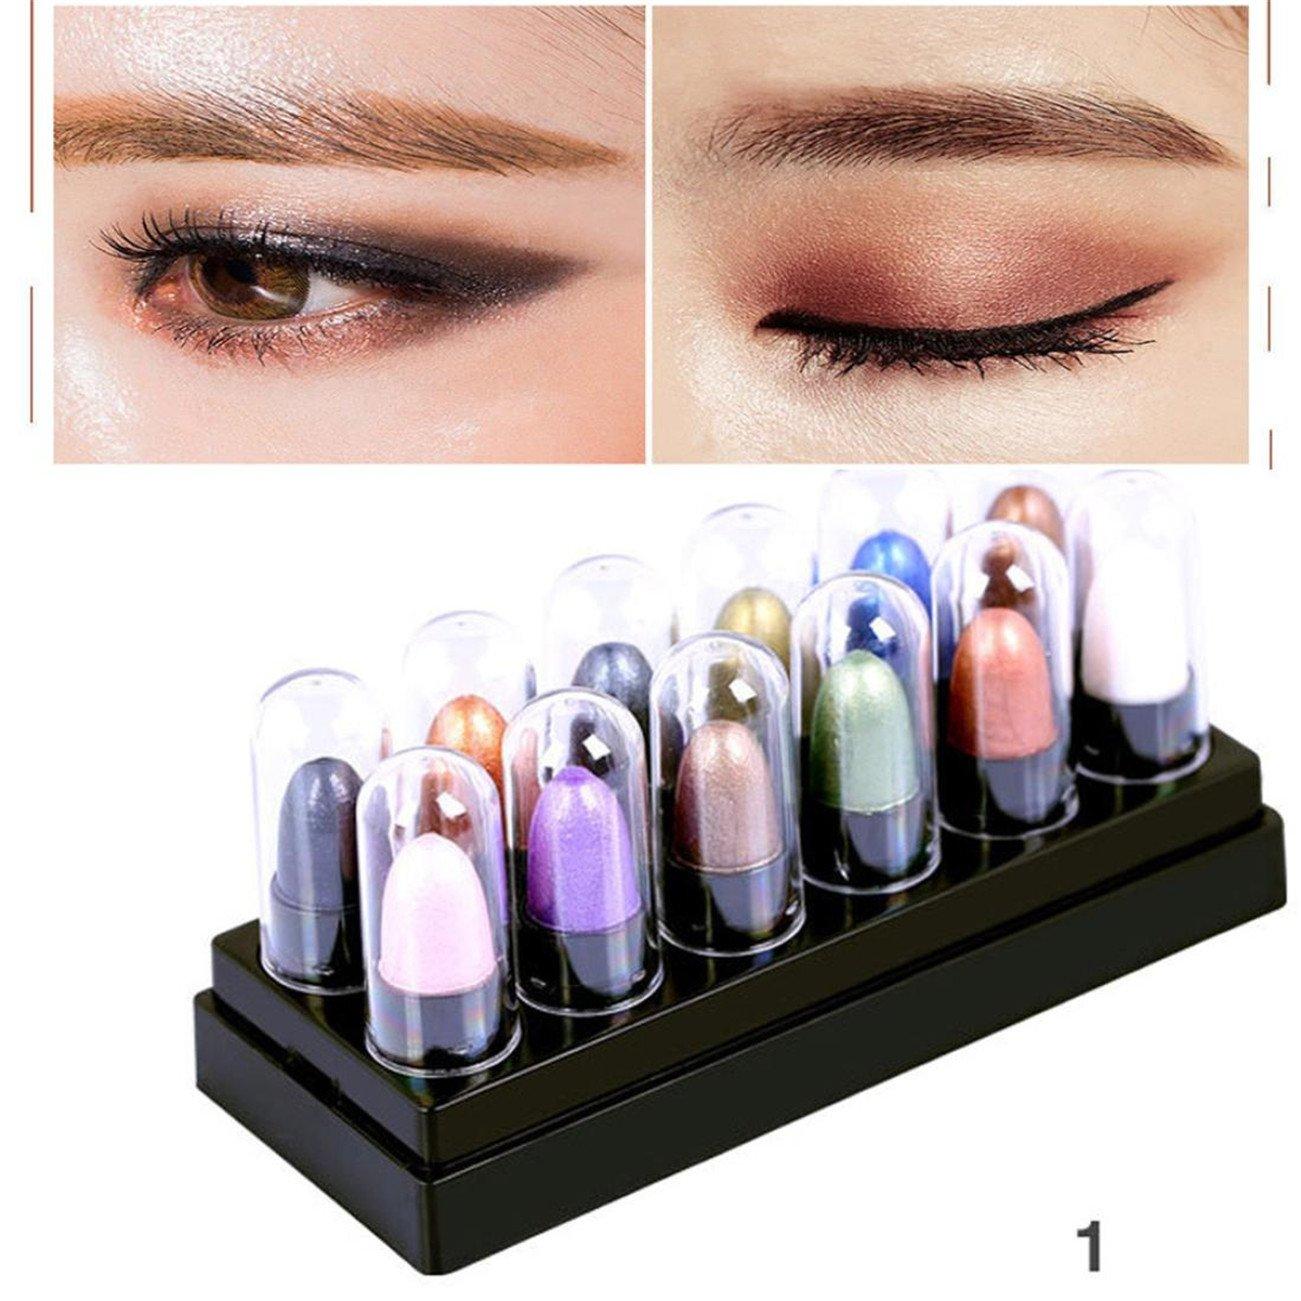 12 Colors Renaissance Eye Shadow Makeup Cosmetic Shimmer Matte Eyeshadow Palette (A)